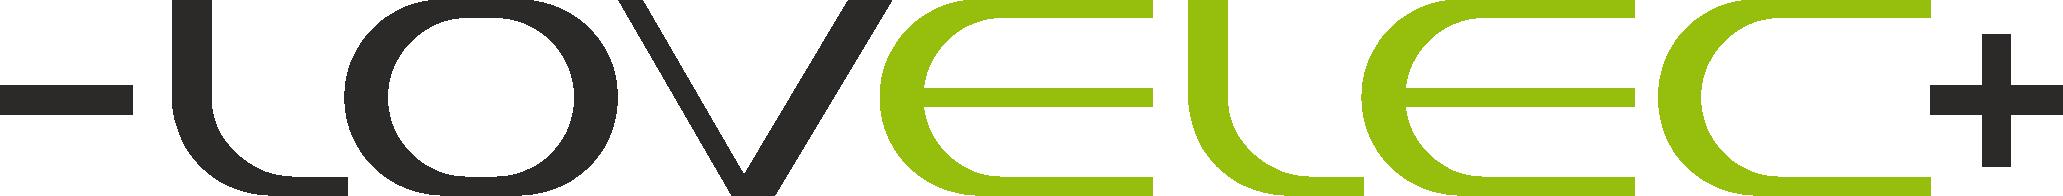 Lovelec logo